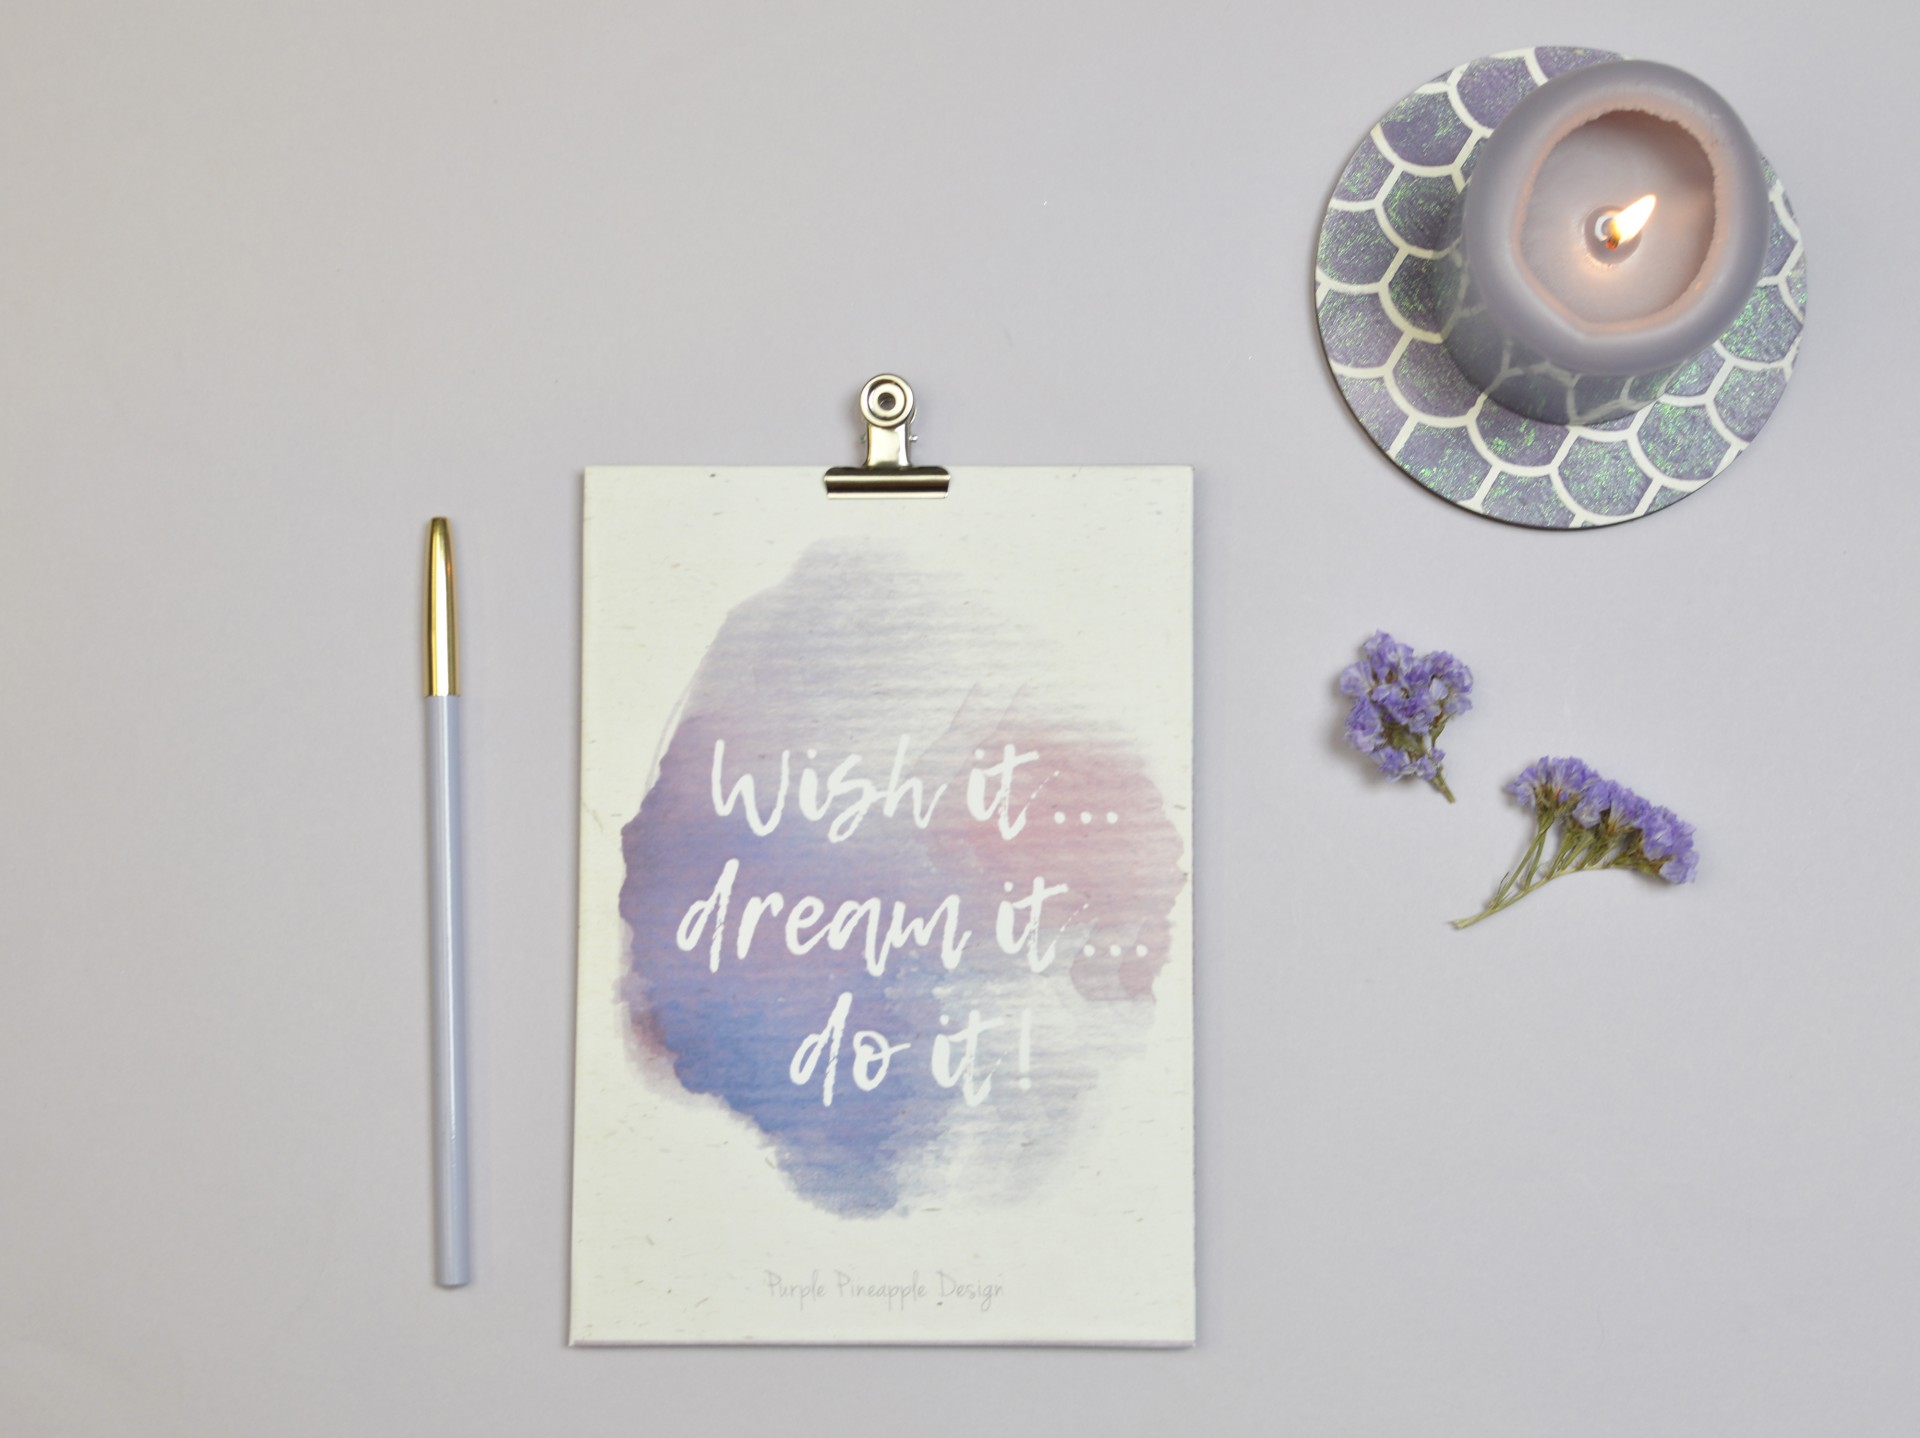 Prancheta Wish it, dream it, do it!